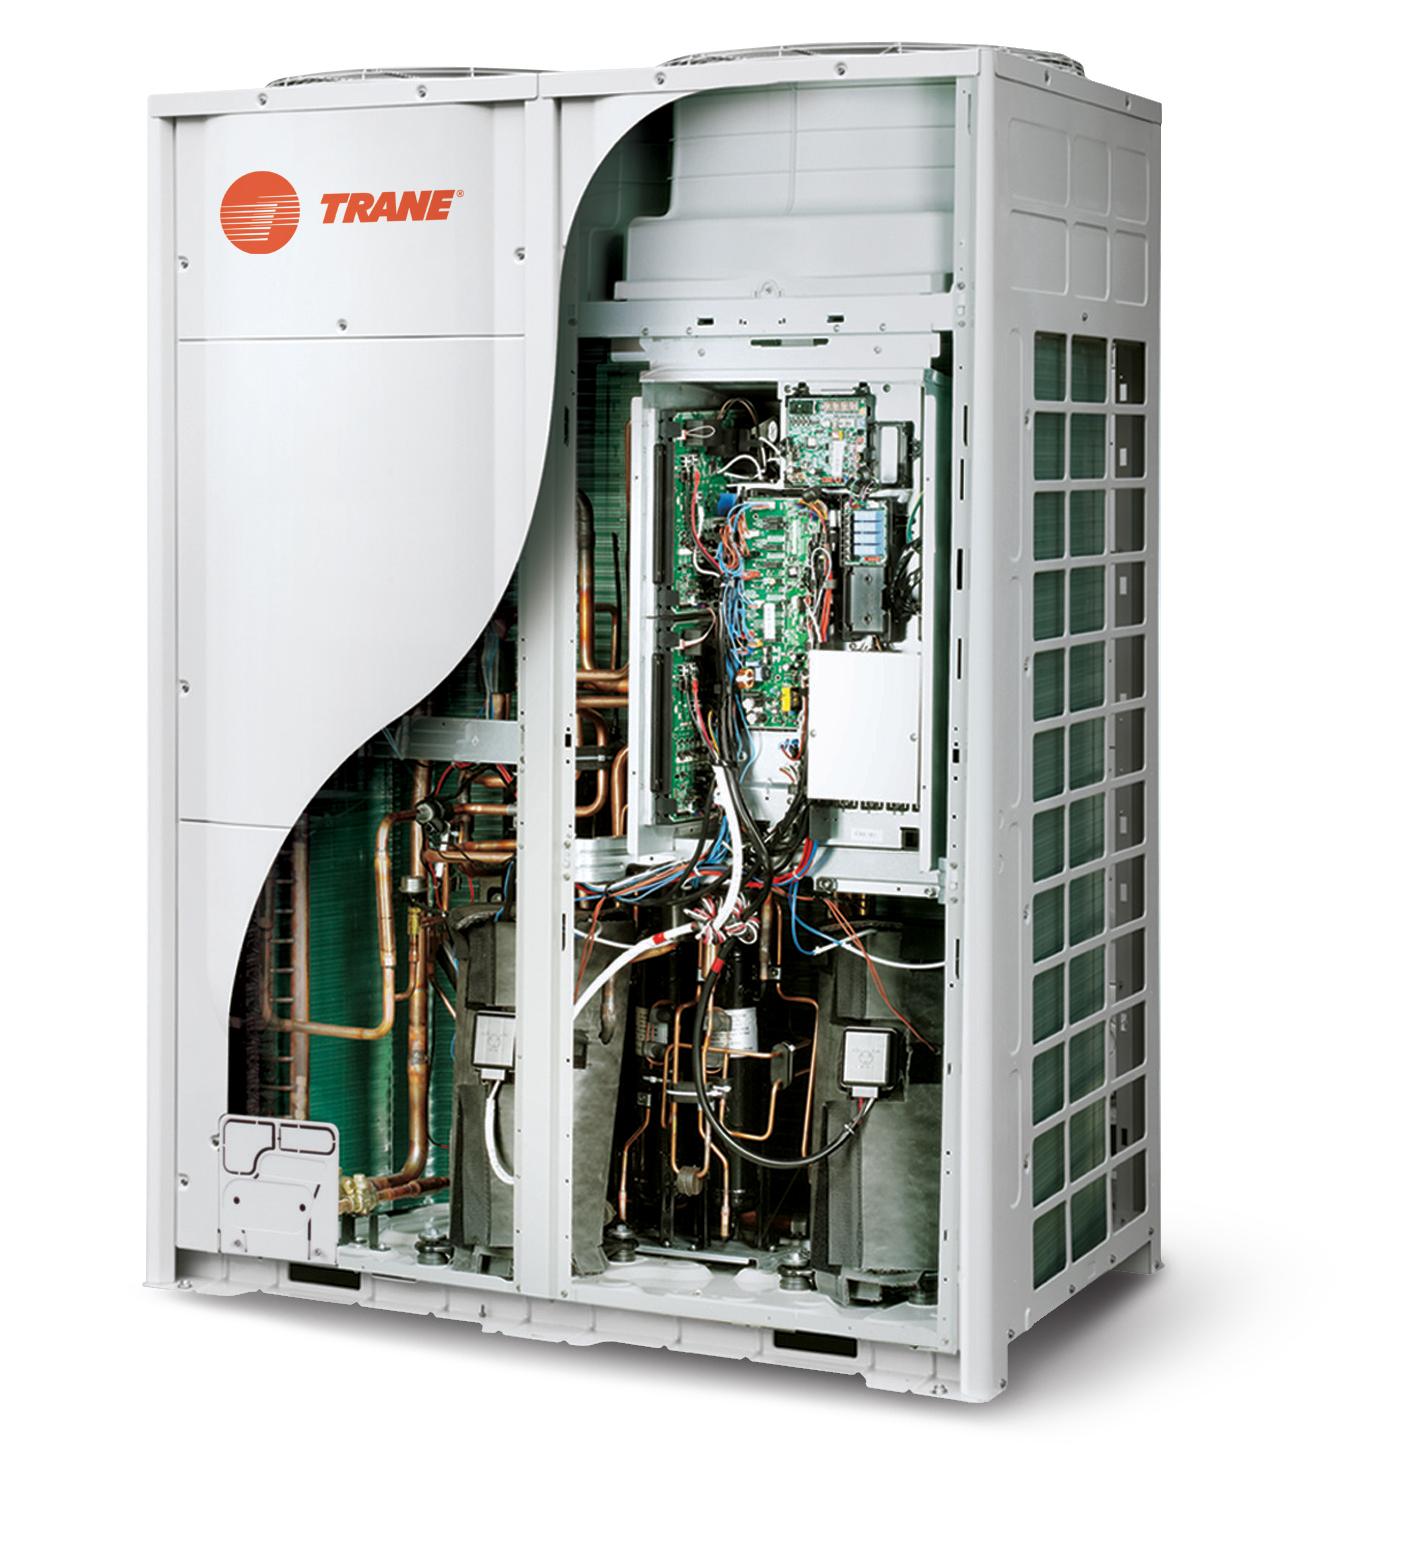 Trane xe90 wiring diagram electrical and electronic diagram for Trane xe90 blower motor